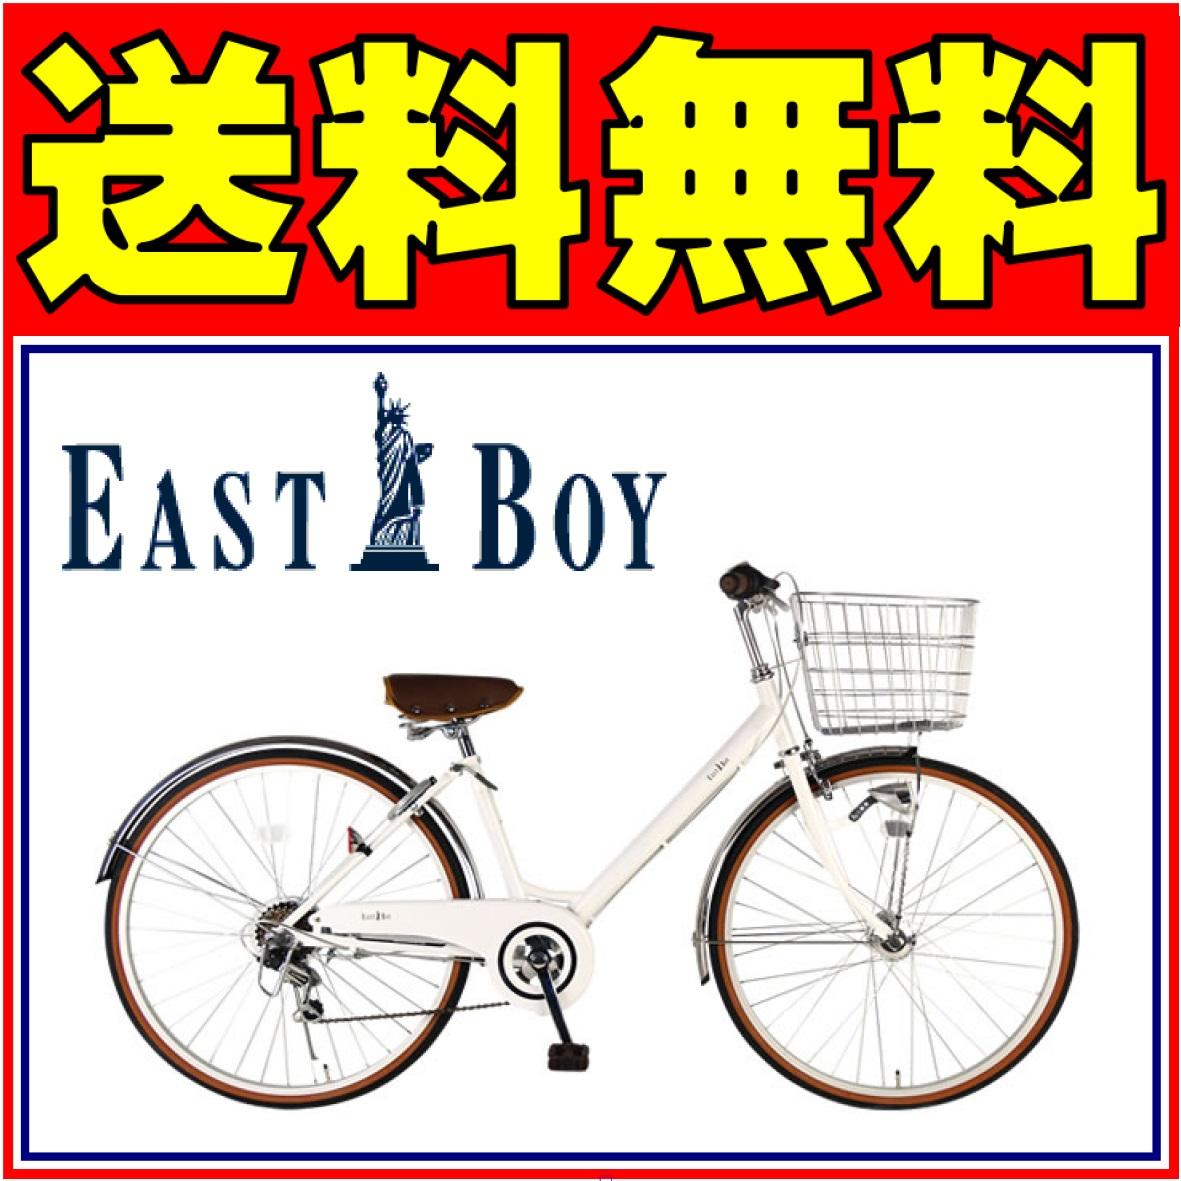 EASTBOY イーストボーイ 自転車 シティサイクル ホワイト 女子高生、女子中学生の通学に最適 カジュアルシティ 外装6段ギア シティ車 26インチ 鍵付き LEDオートライト イーストボーイ 自転車 女子